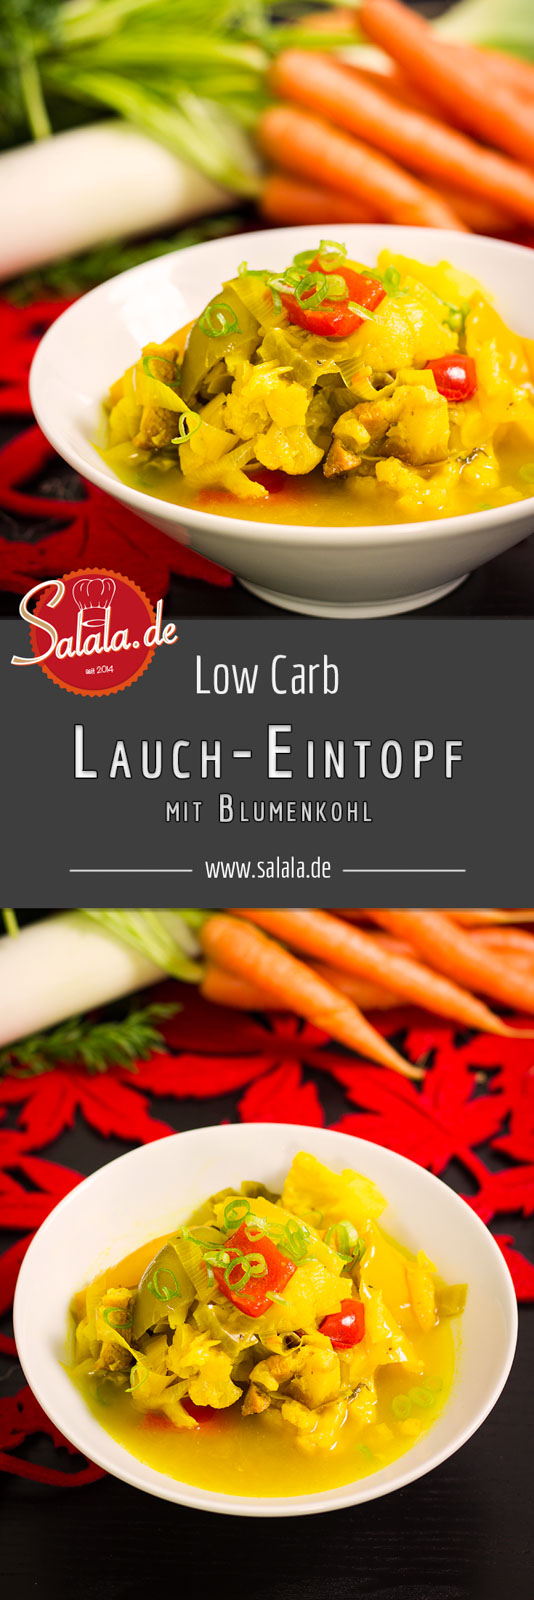 Blumenkohl-Lauch-Eintopf - by salala.de - vorkochen Lauch Blumenkohl Paprika Kurkuma Rezept Low Carb Suppe